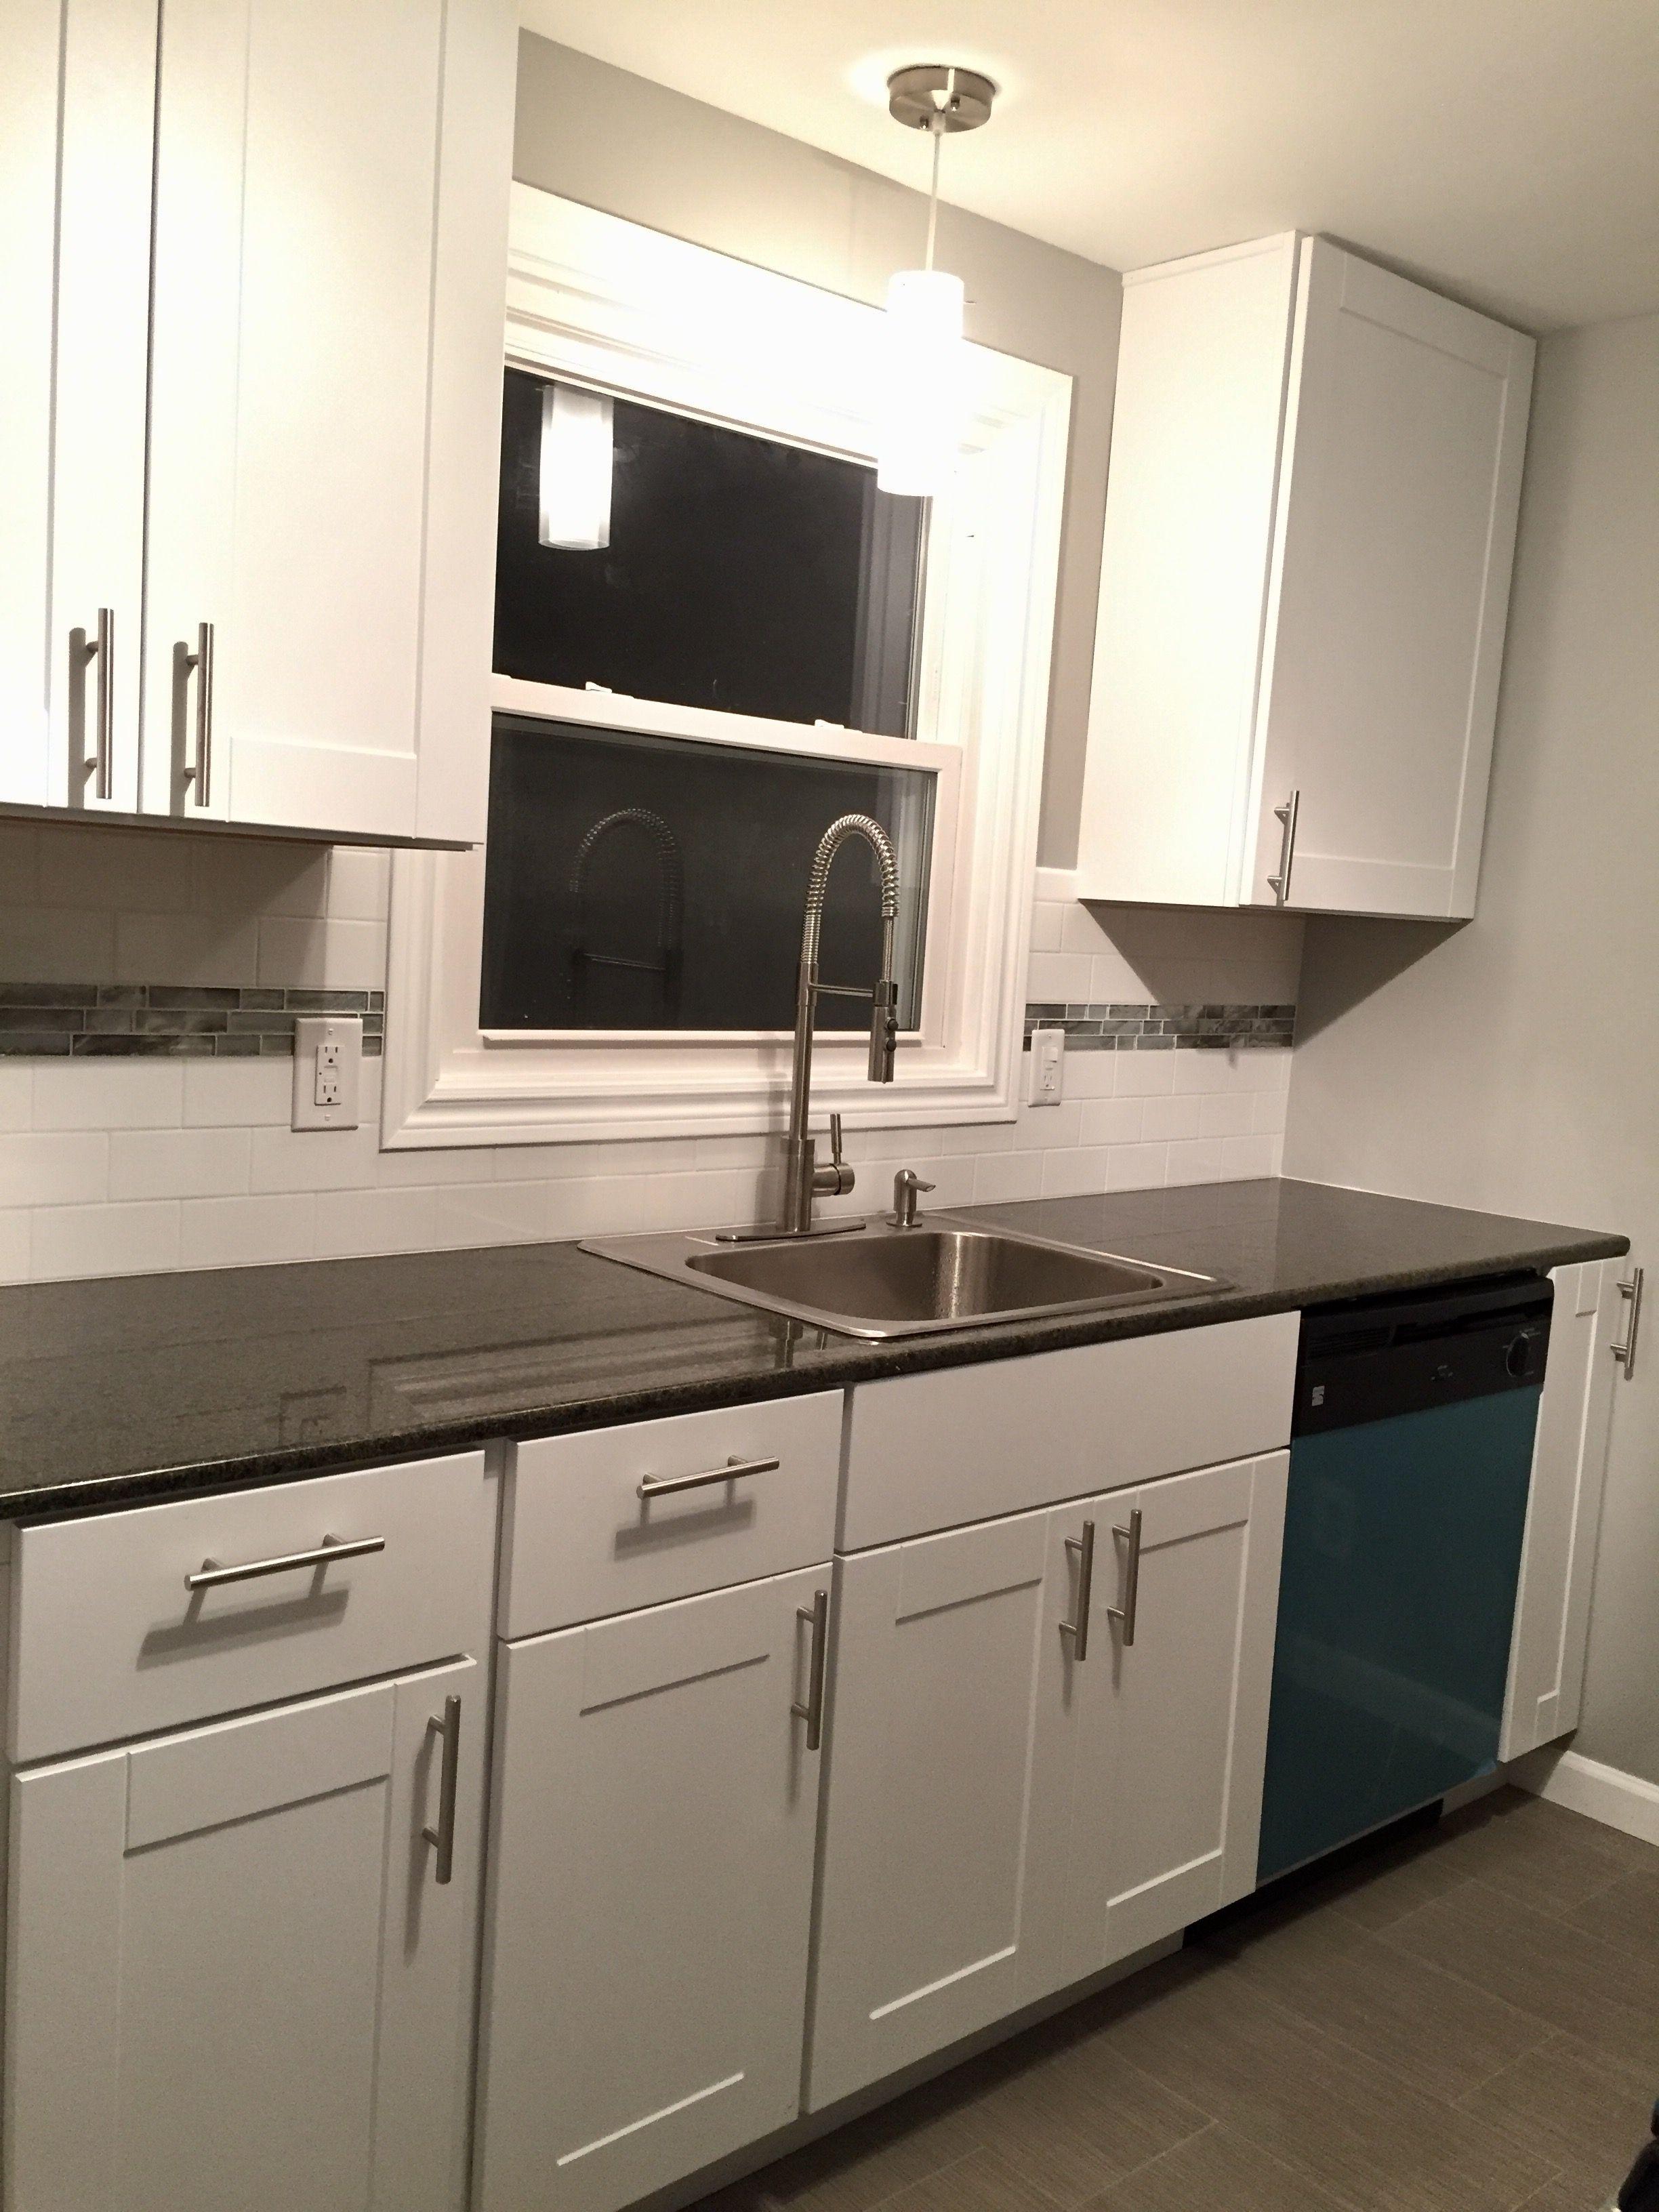 Download Wallpaper Home Depot White Upper Kitchen Cabinets